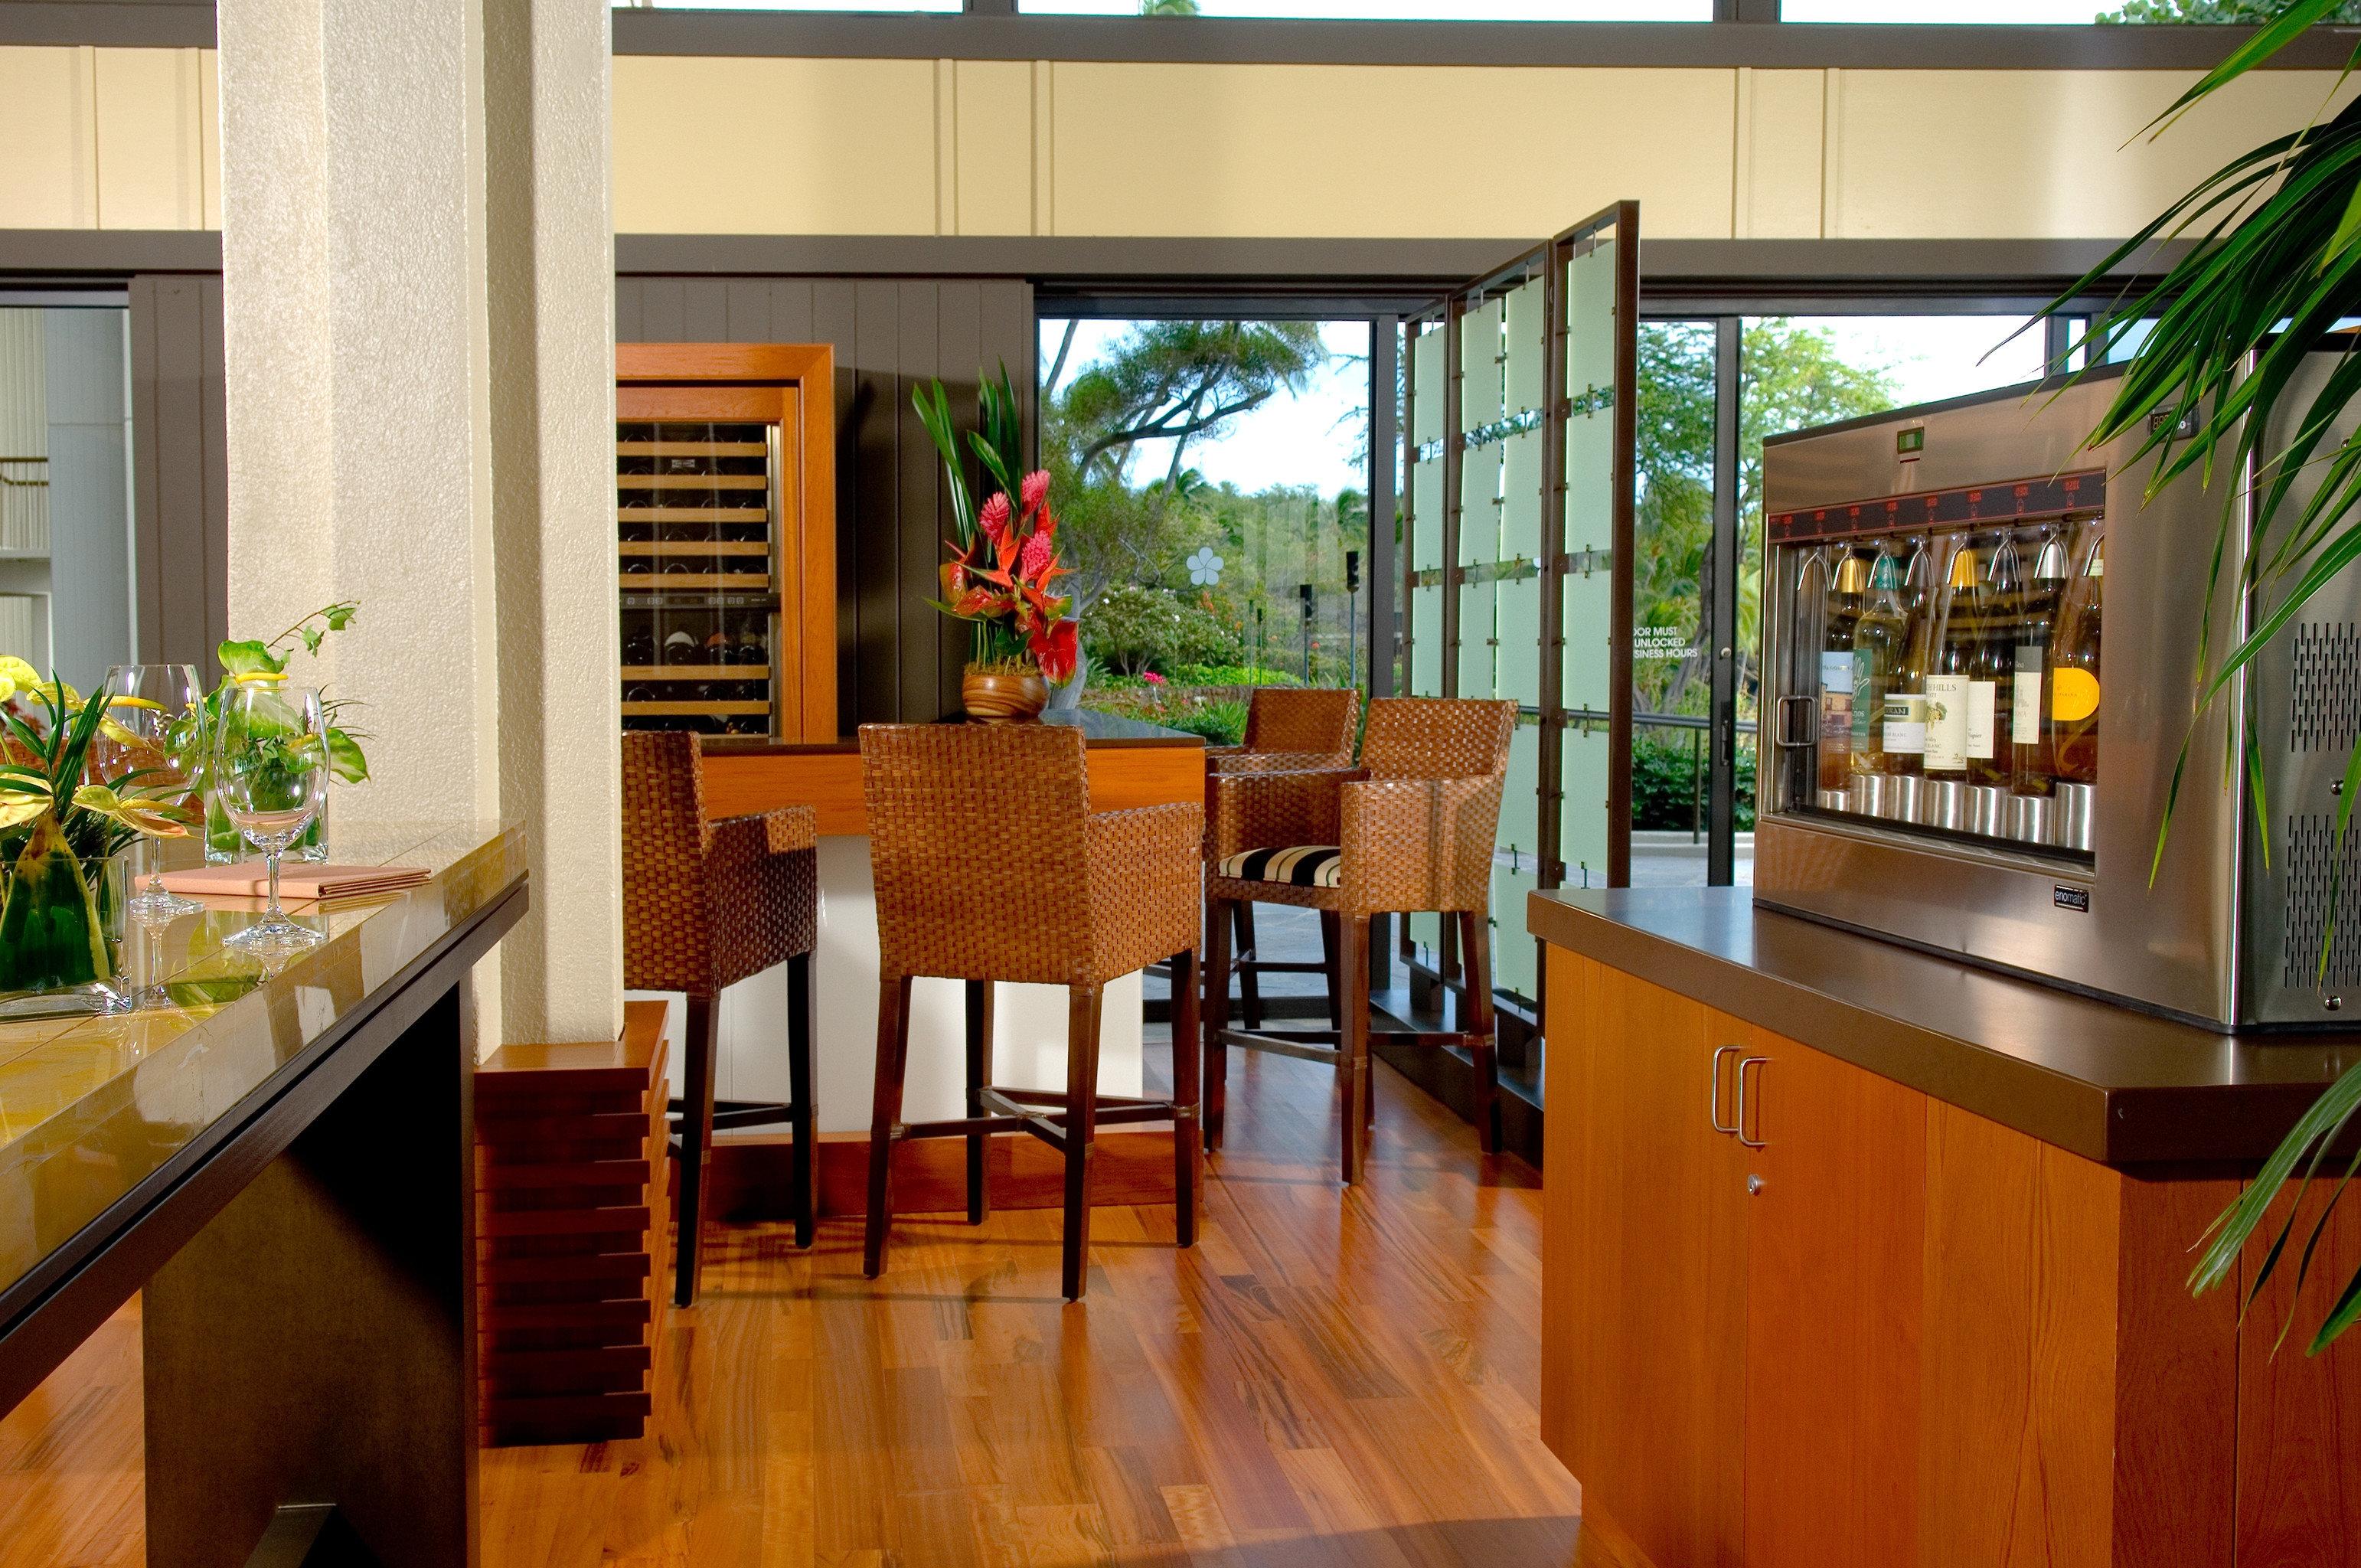 Bar Drink Lounge Resort Scenic views property Lobby home hardwood Dining wooden restaurant condominium living room dining table